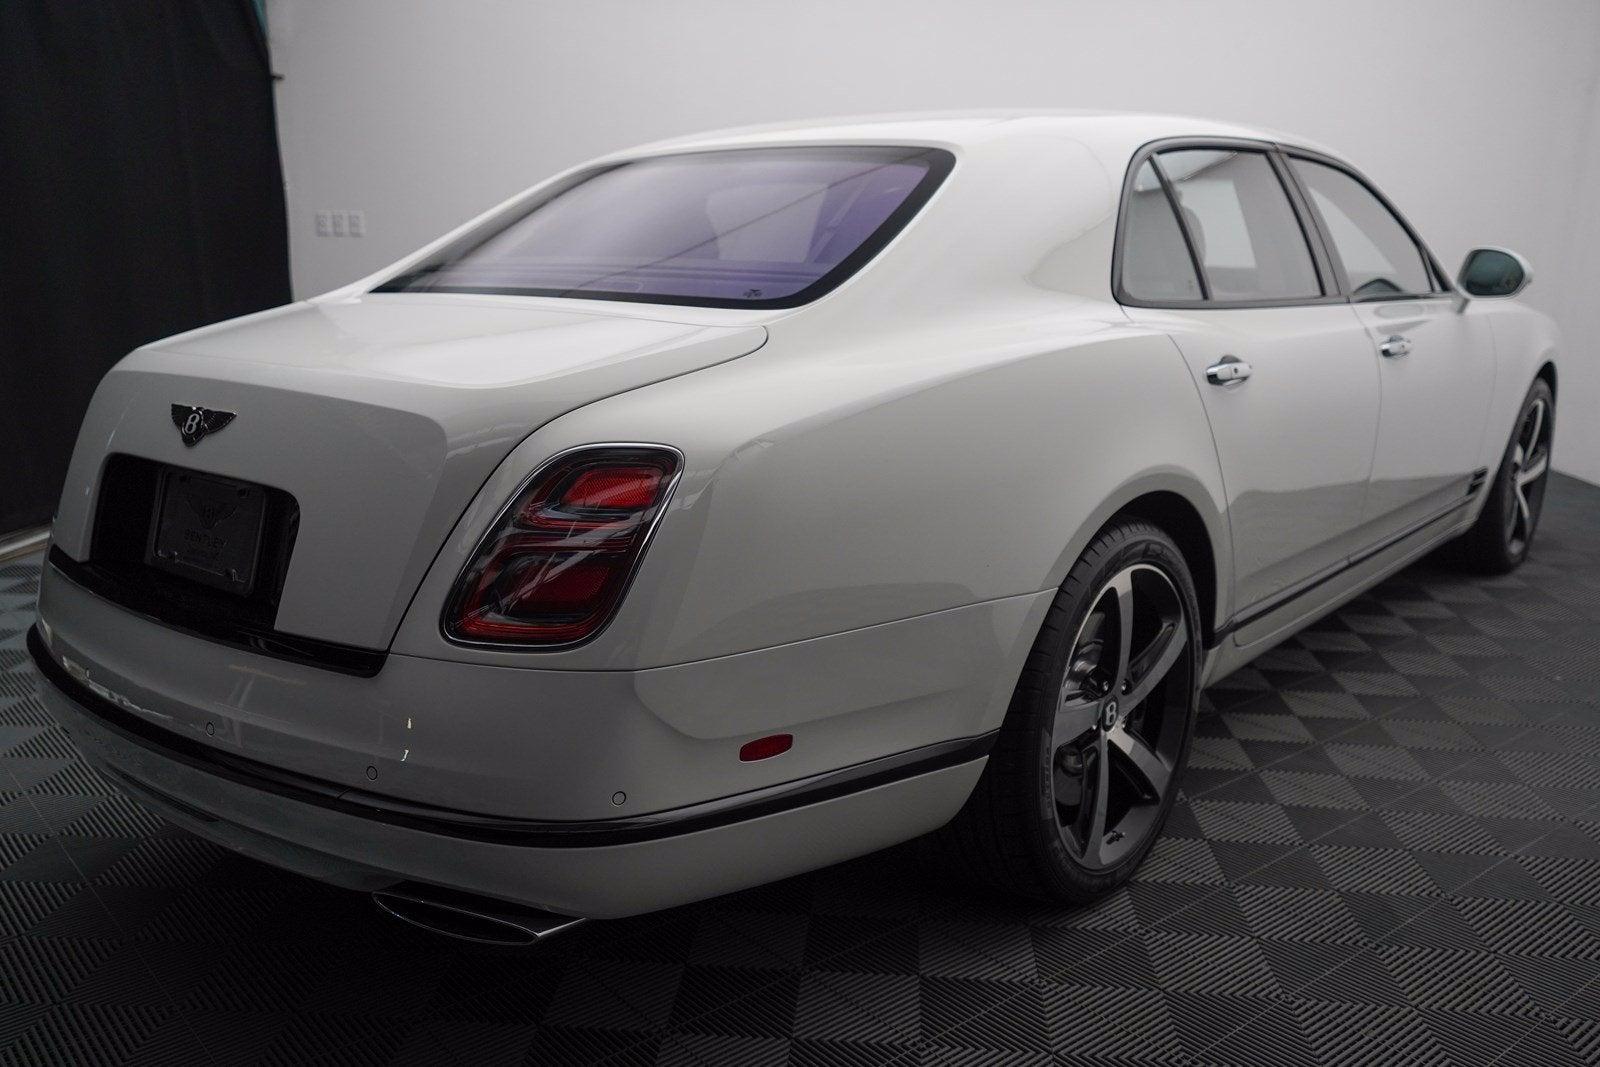 2018 Bentley Mulsanne Charlotte NC